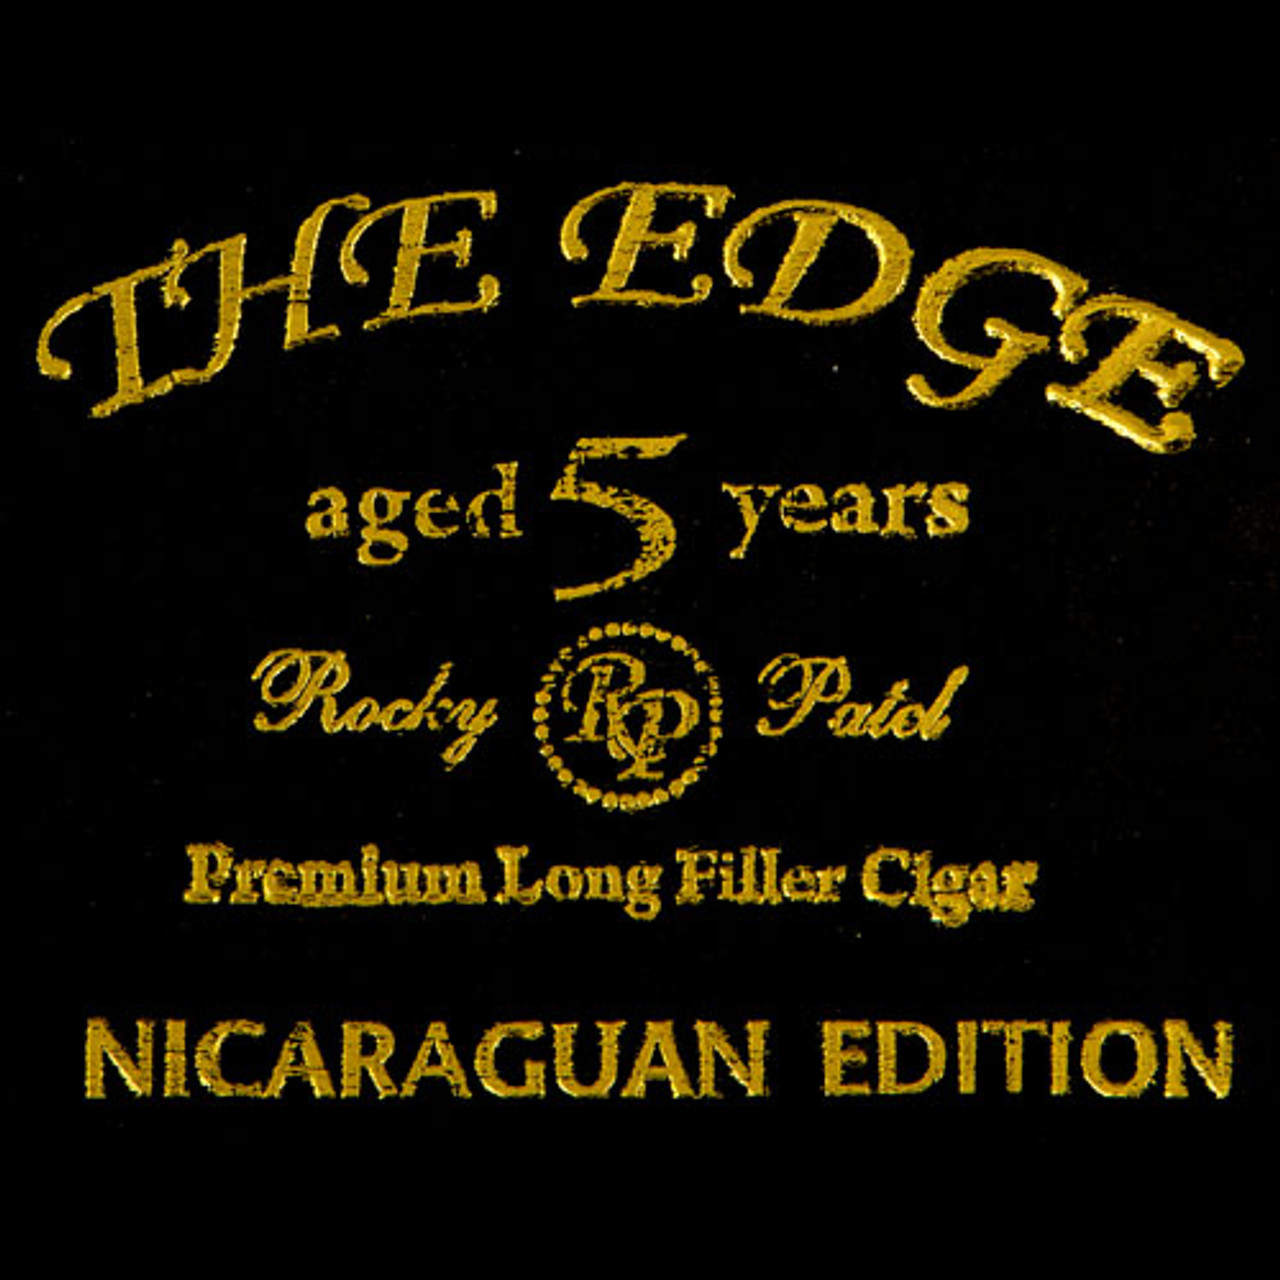 Rocky Patel The Edge Habano Torpedo Cigars - 6 x 52 (Box of 20)